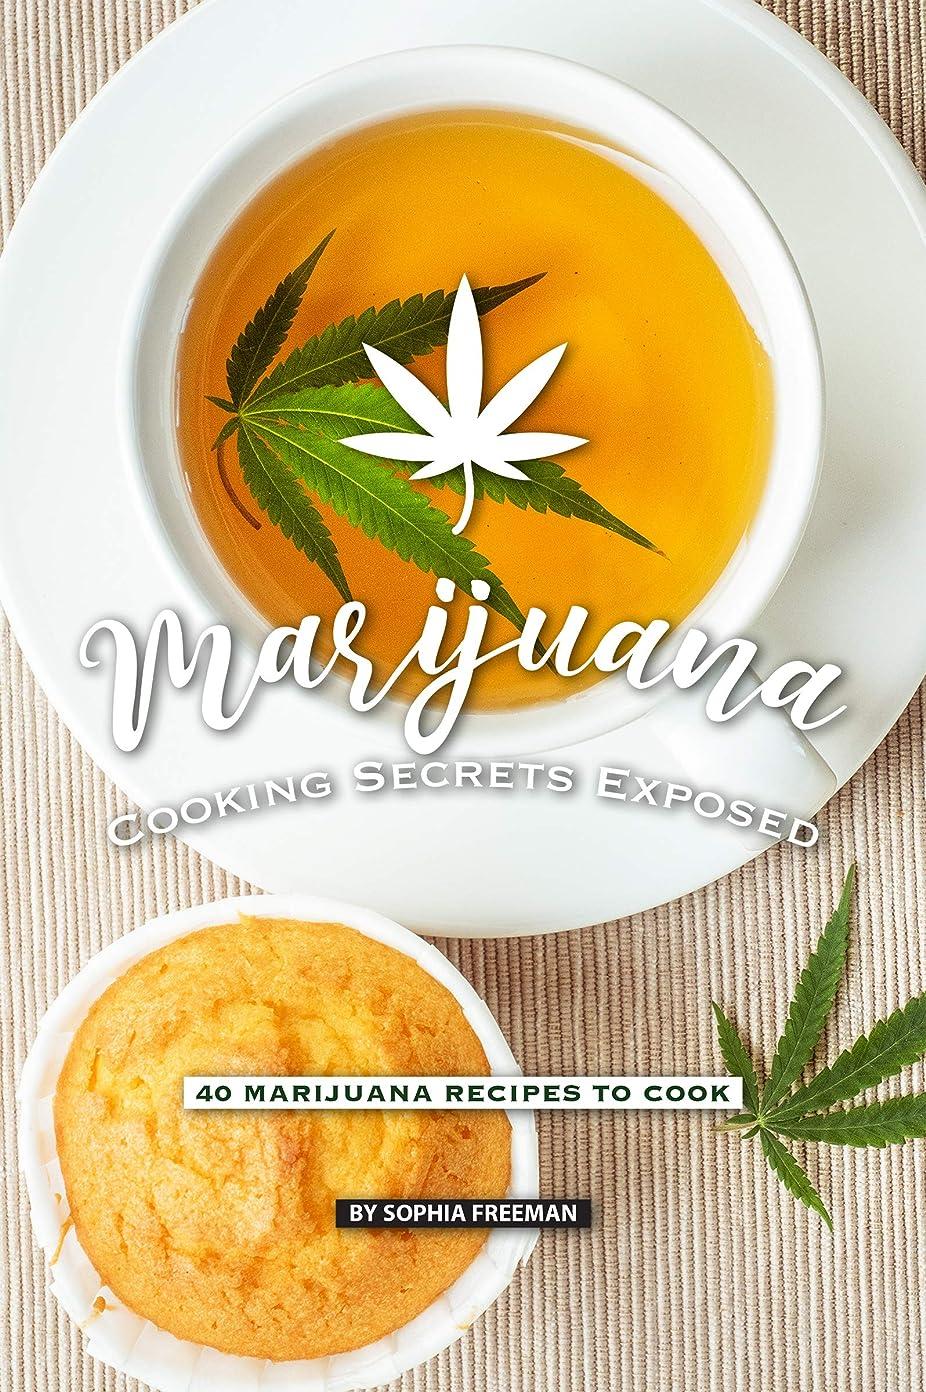 Marijuana Cooking Secrets Exposed: 40 Marijuana Recipes to Cook (English Edition)